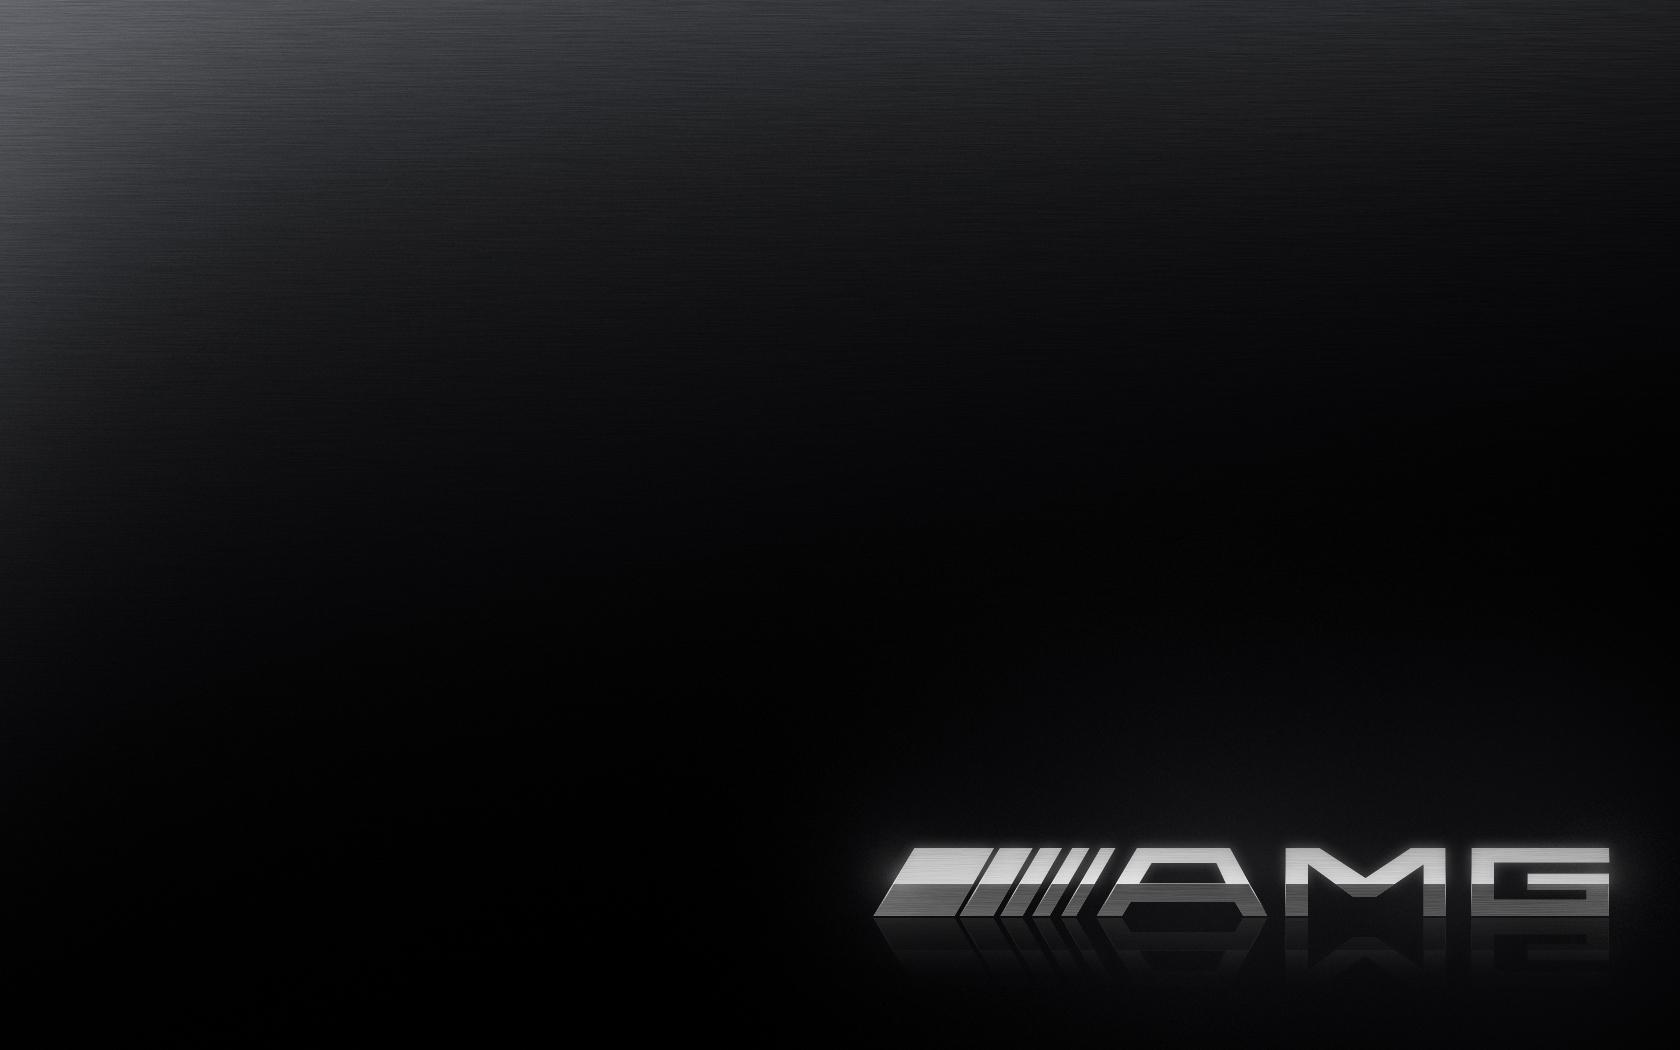 AMG Logo Wallpaper 1680x1050